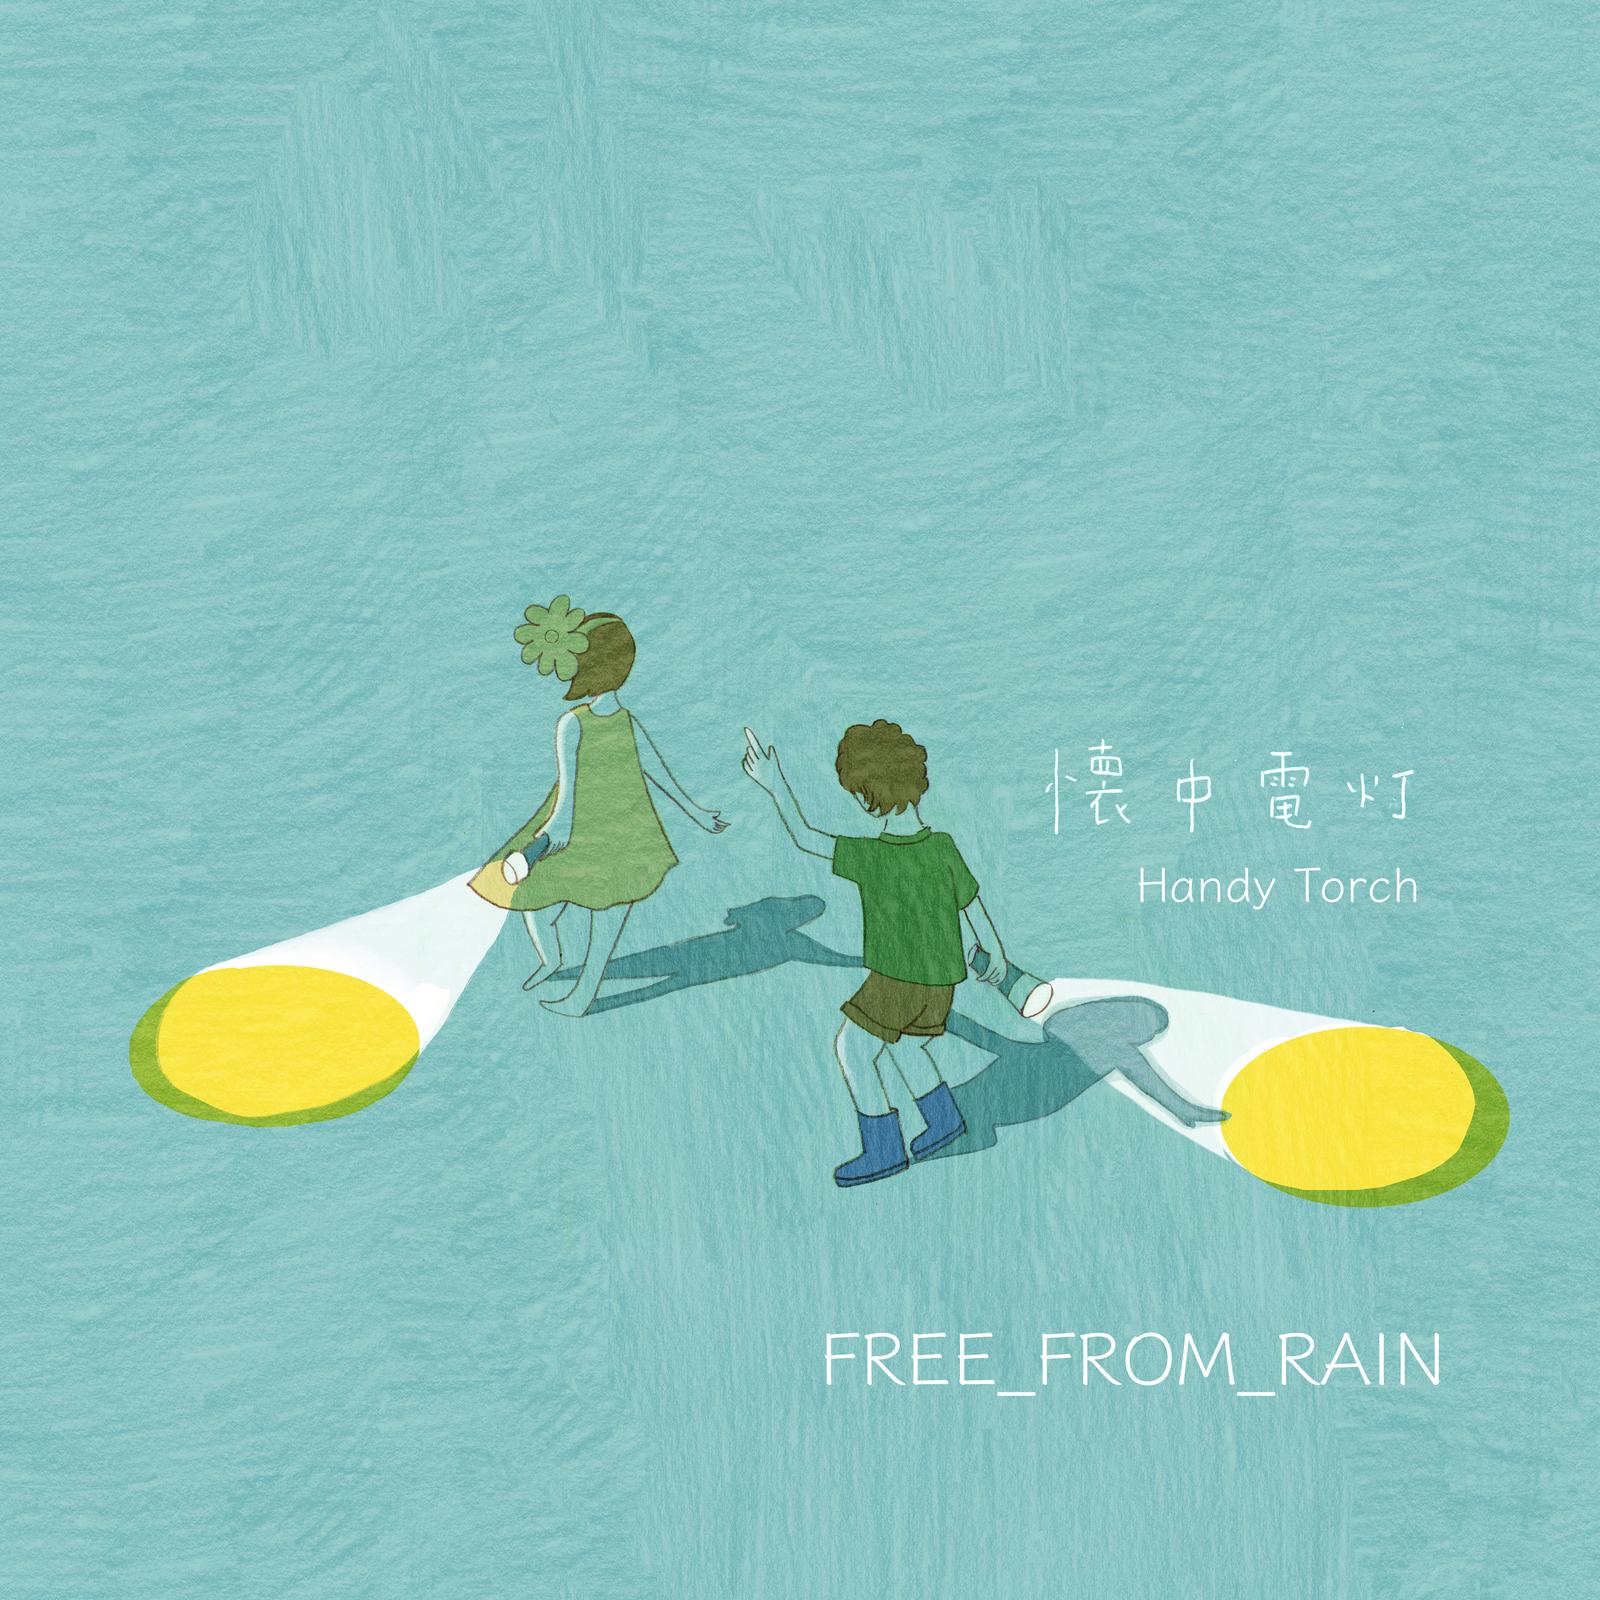 FREE_FROM_RAIN